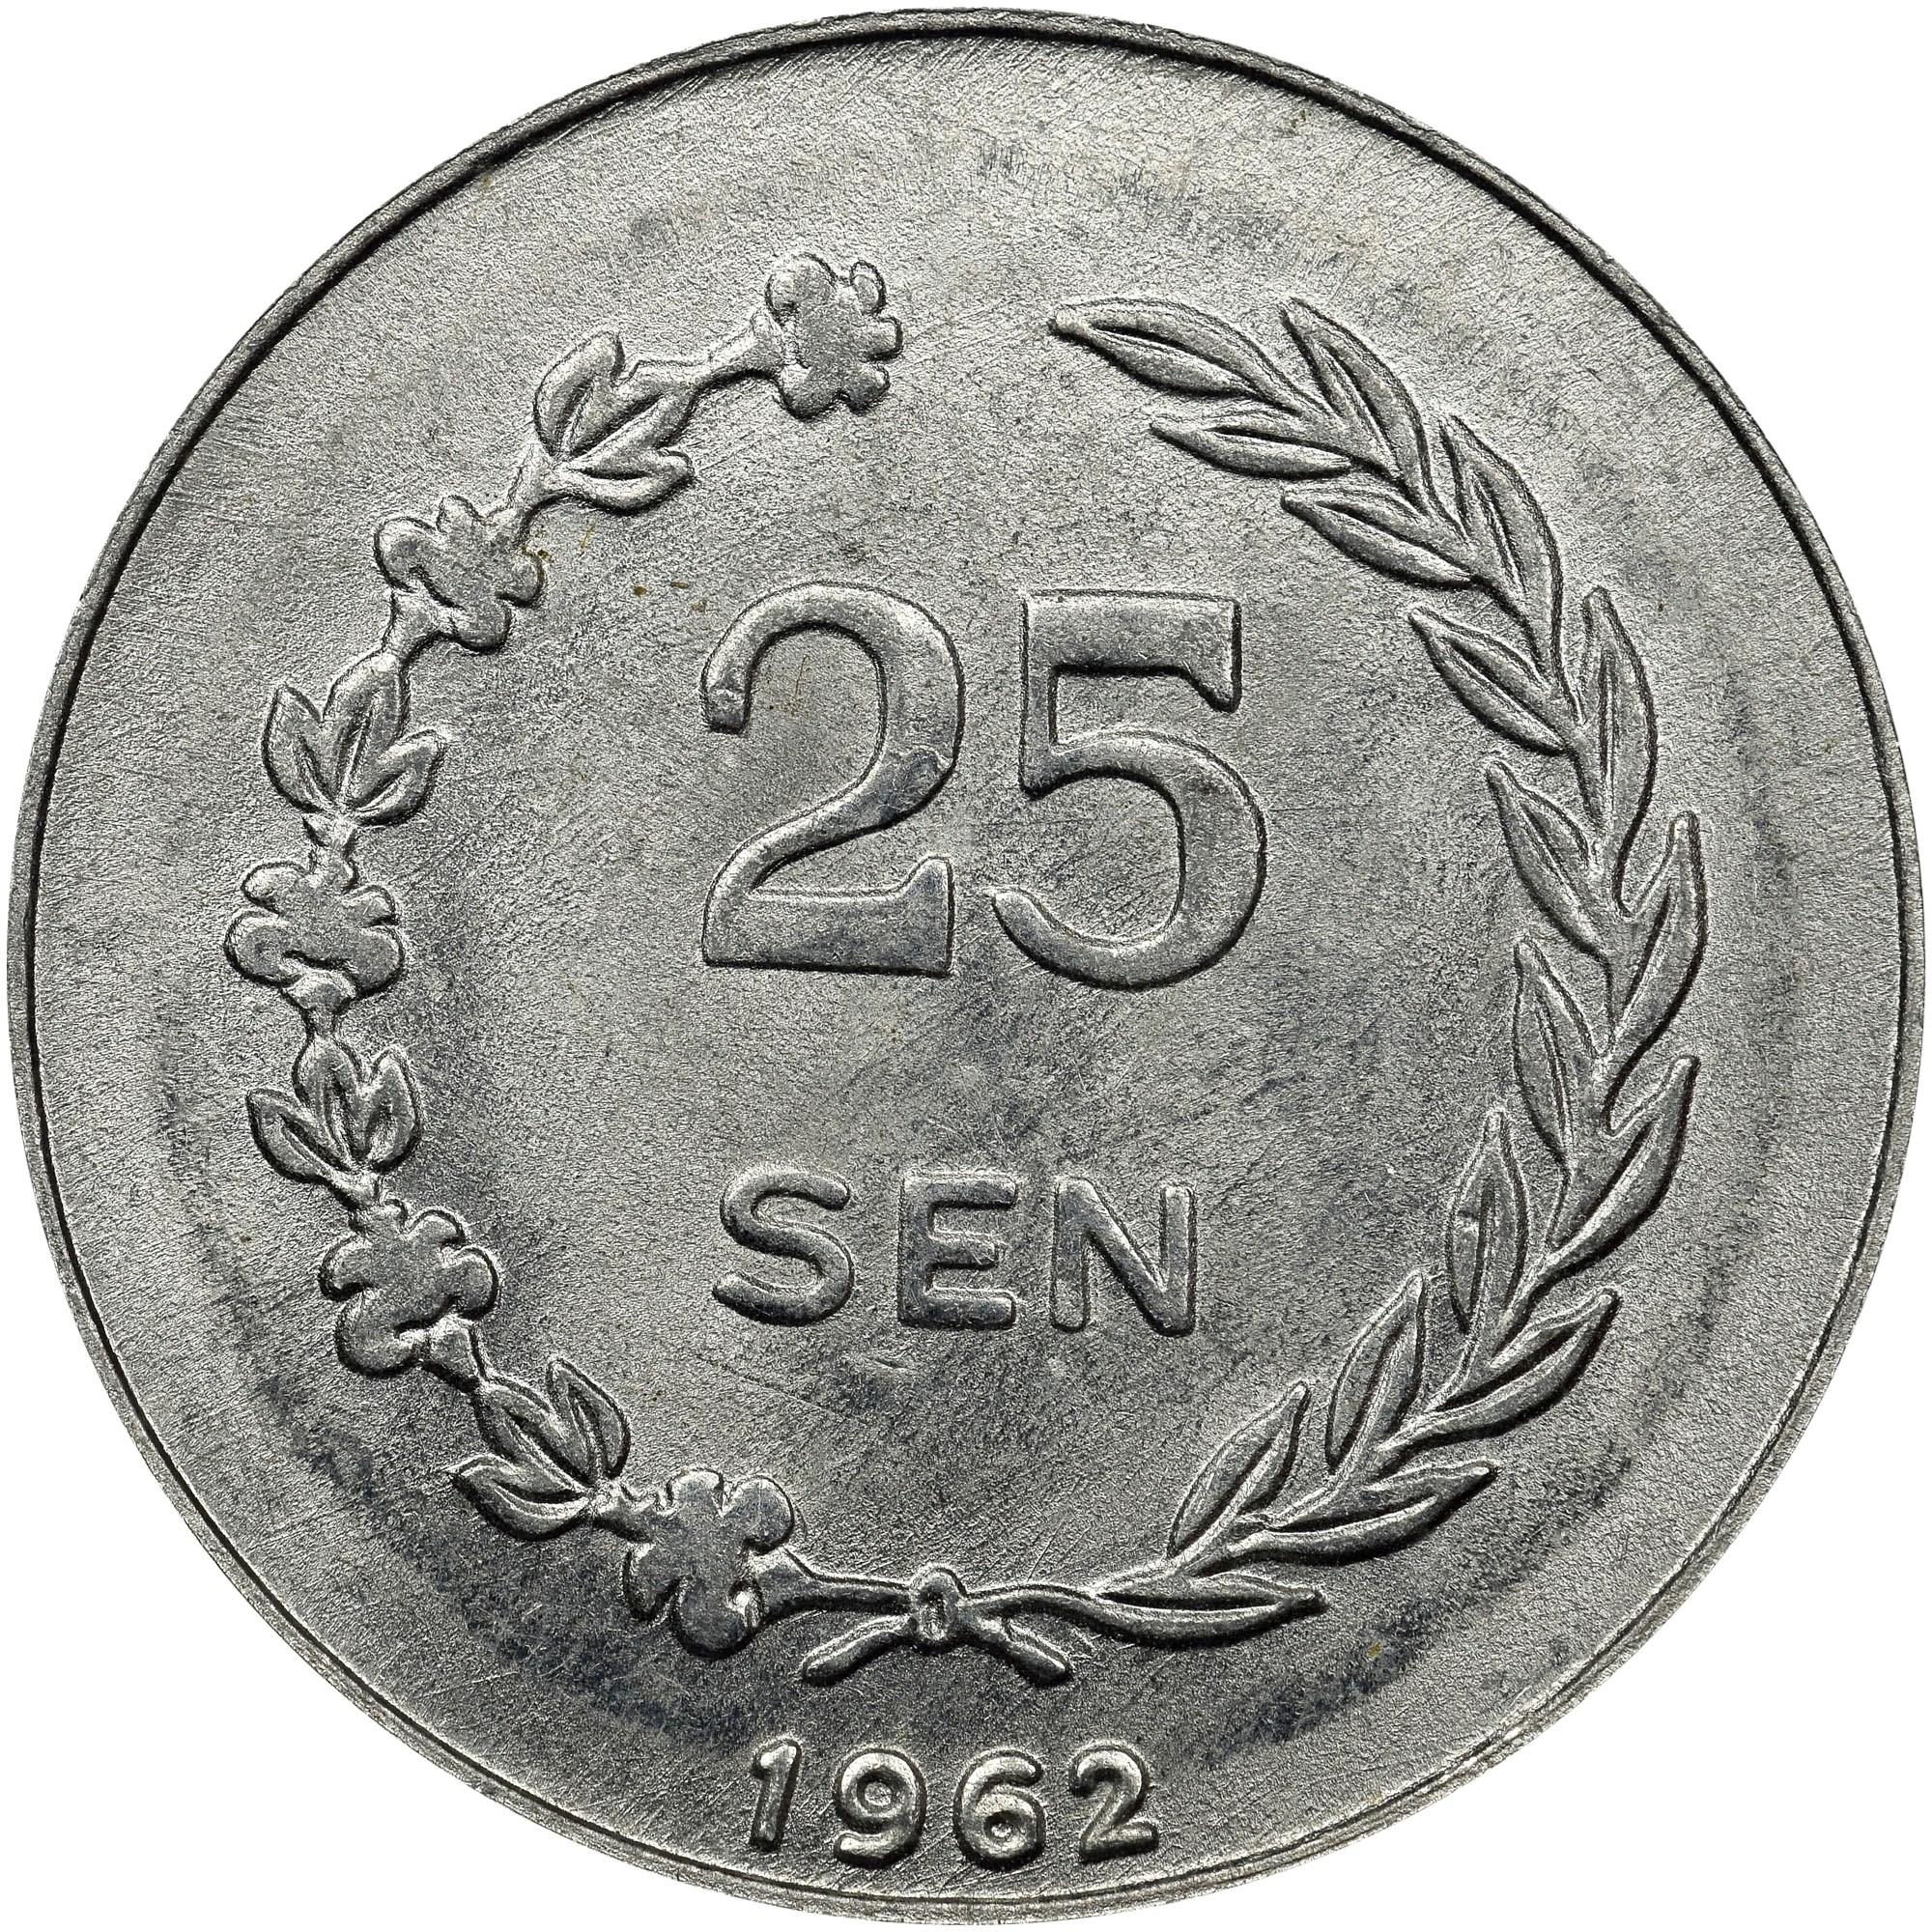 Indonesia IRIAN BARAT 25 Sen reverse